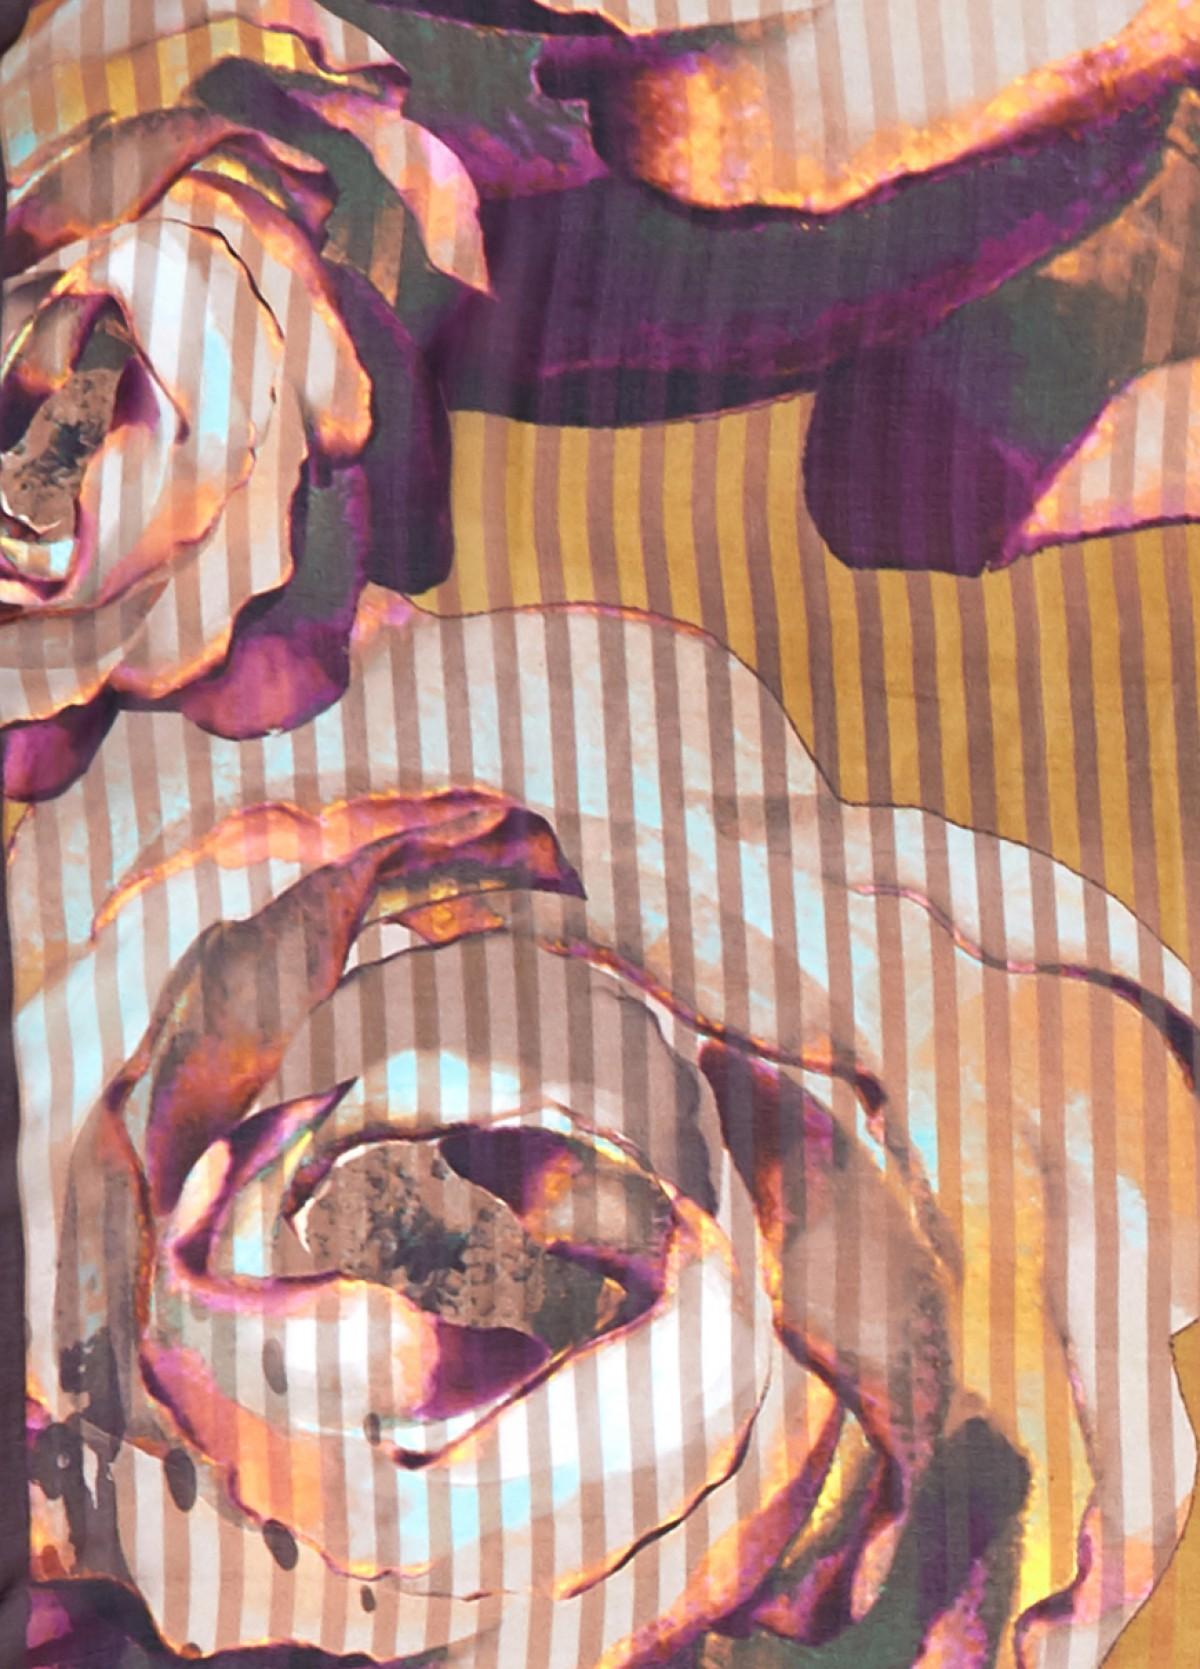 The Floral Streaks Printed Scarf